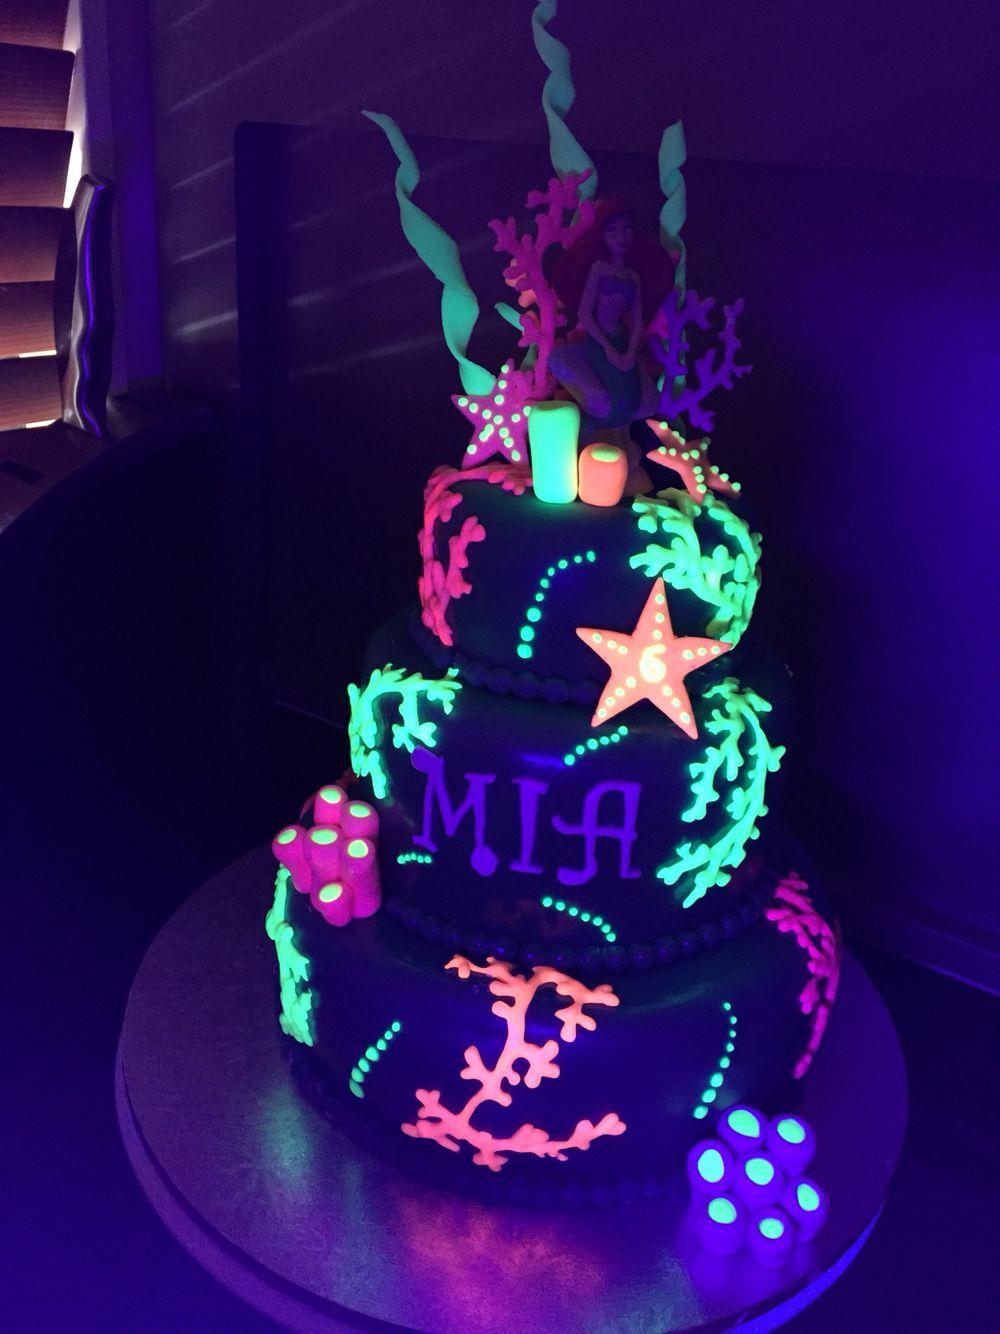 Mia S 8 Th Birthday Glow Cake Idea Instead Do Cheer Theme With